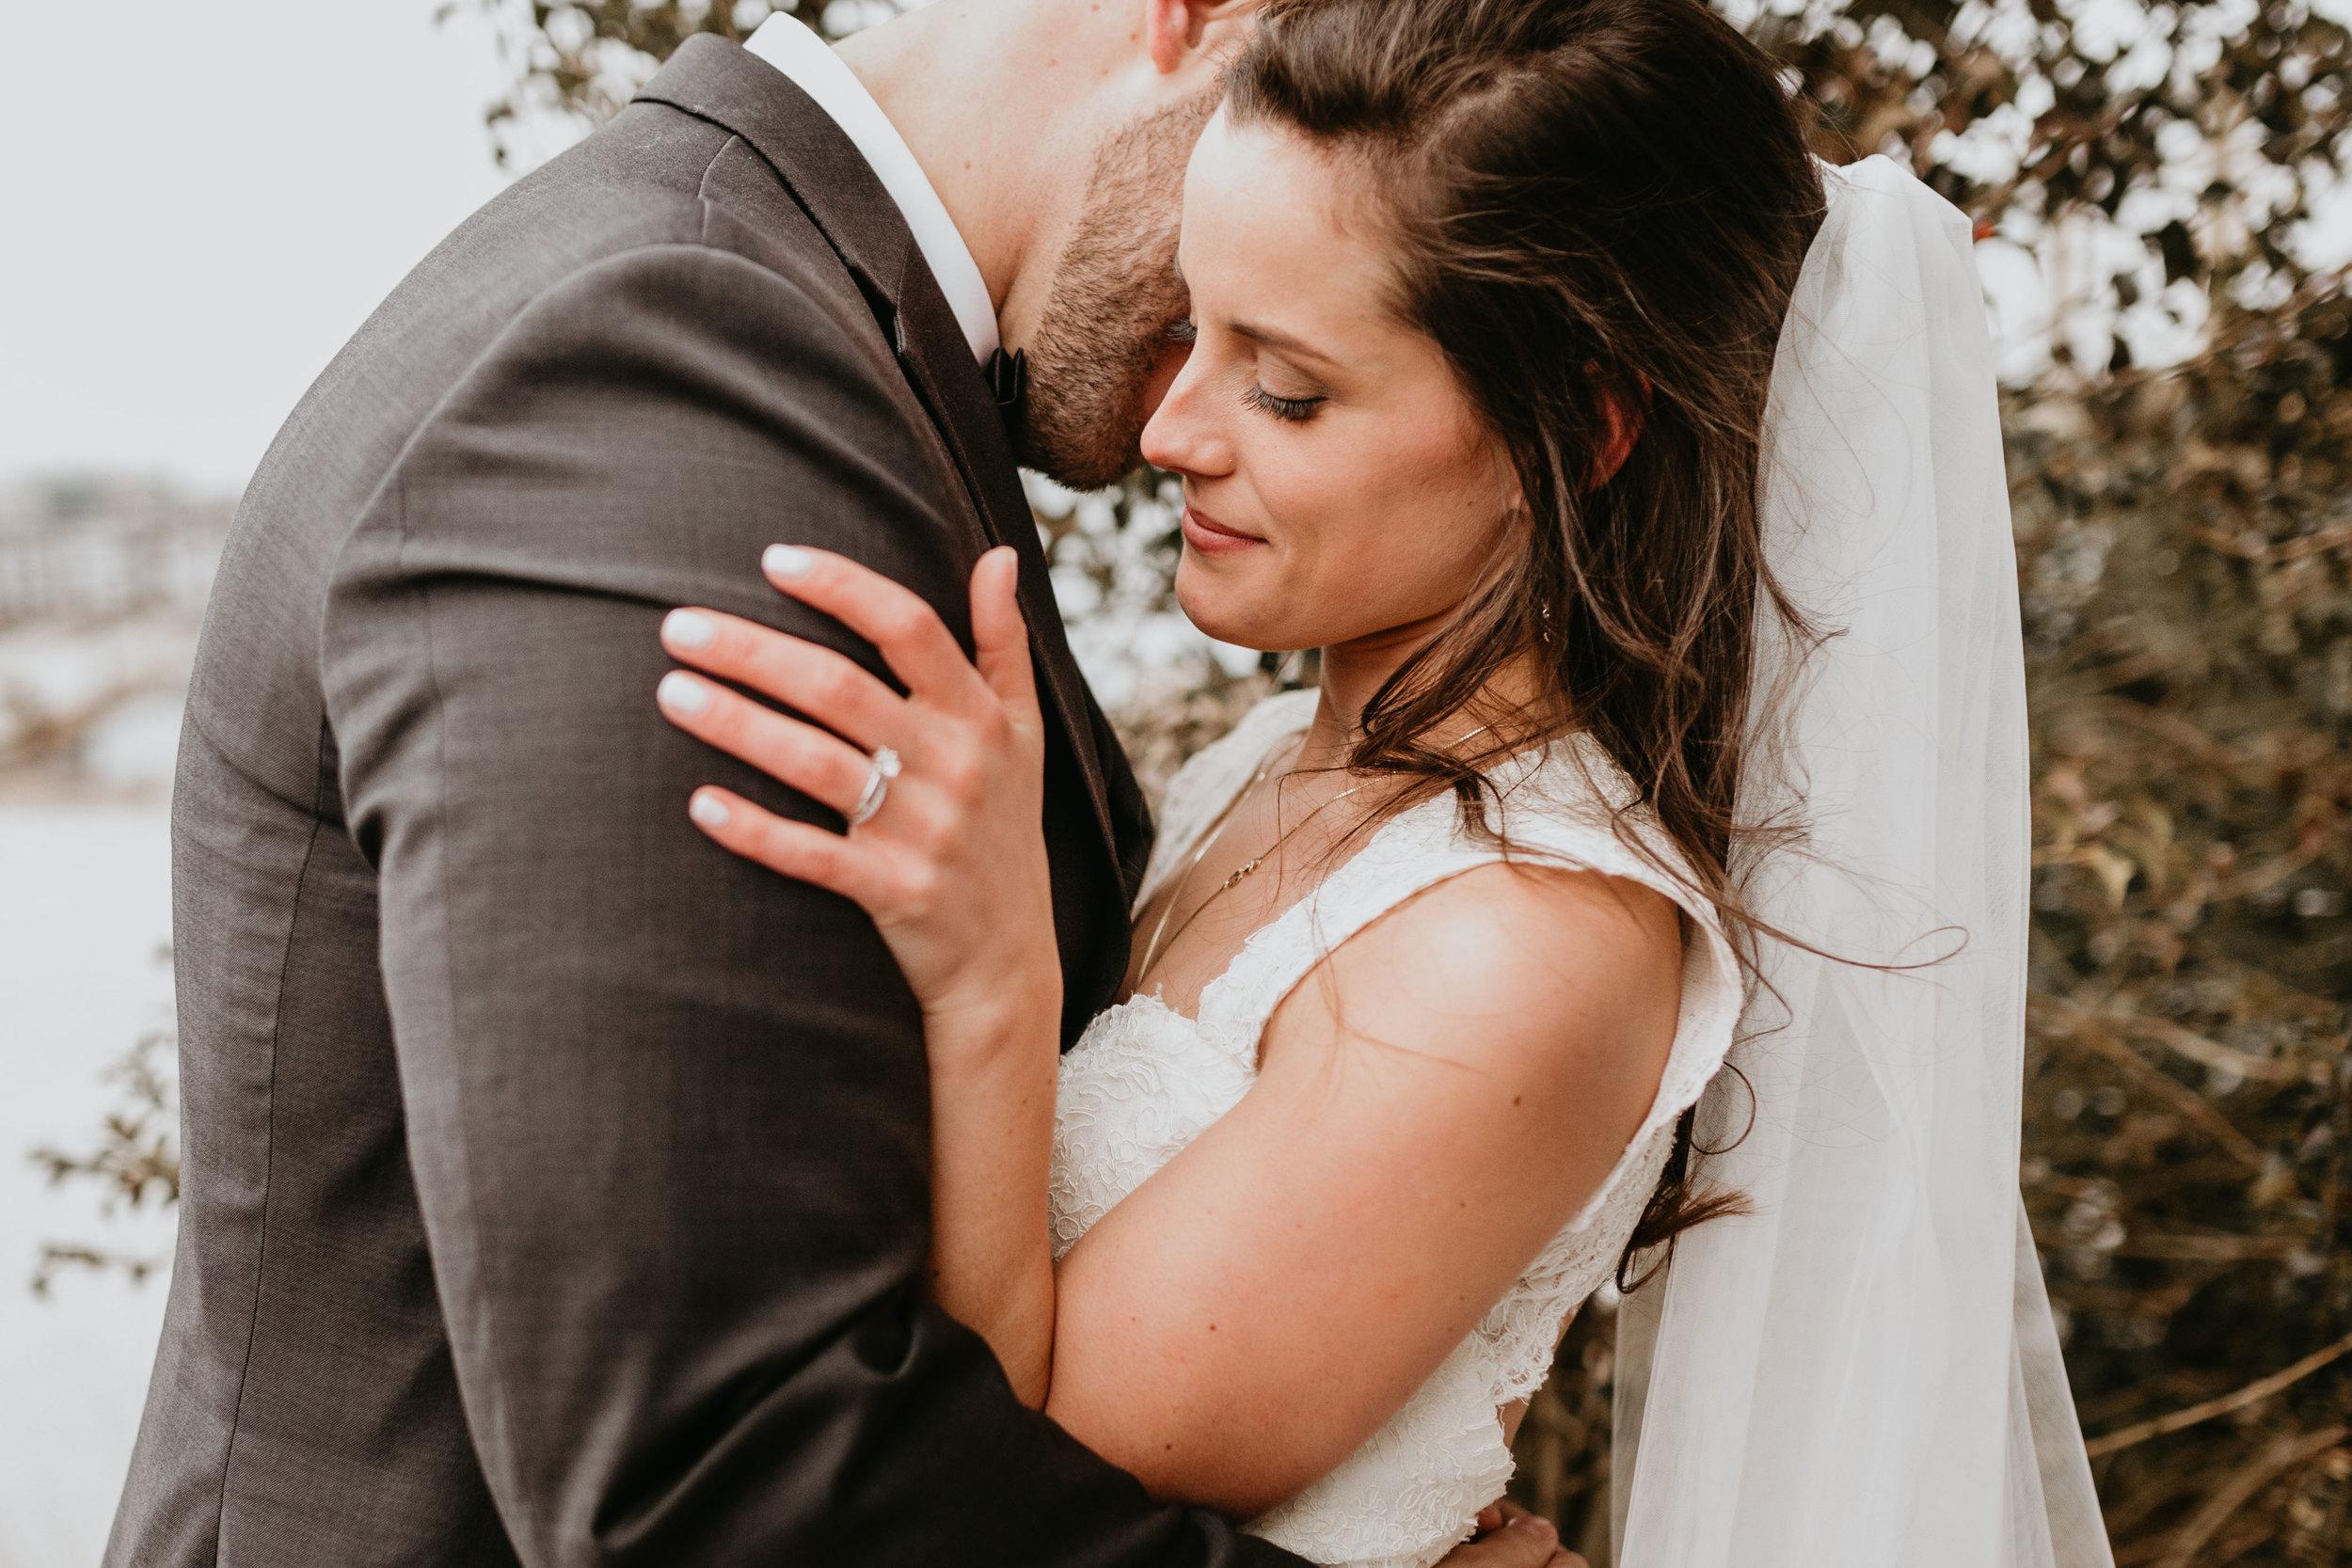 nicole-daacke-photography-boston-massachusetts-seaside-intimate-winter-wedding-photographer-39.jpg